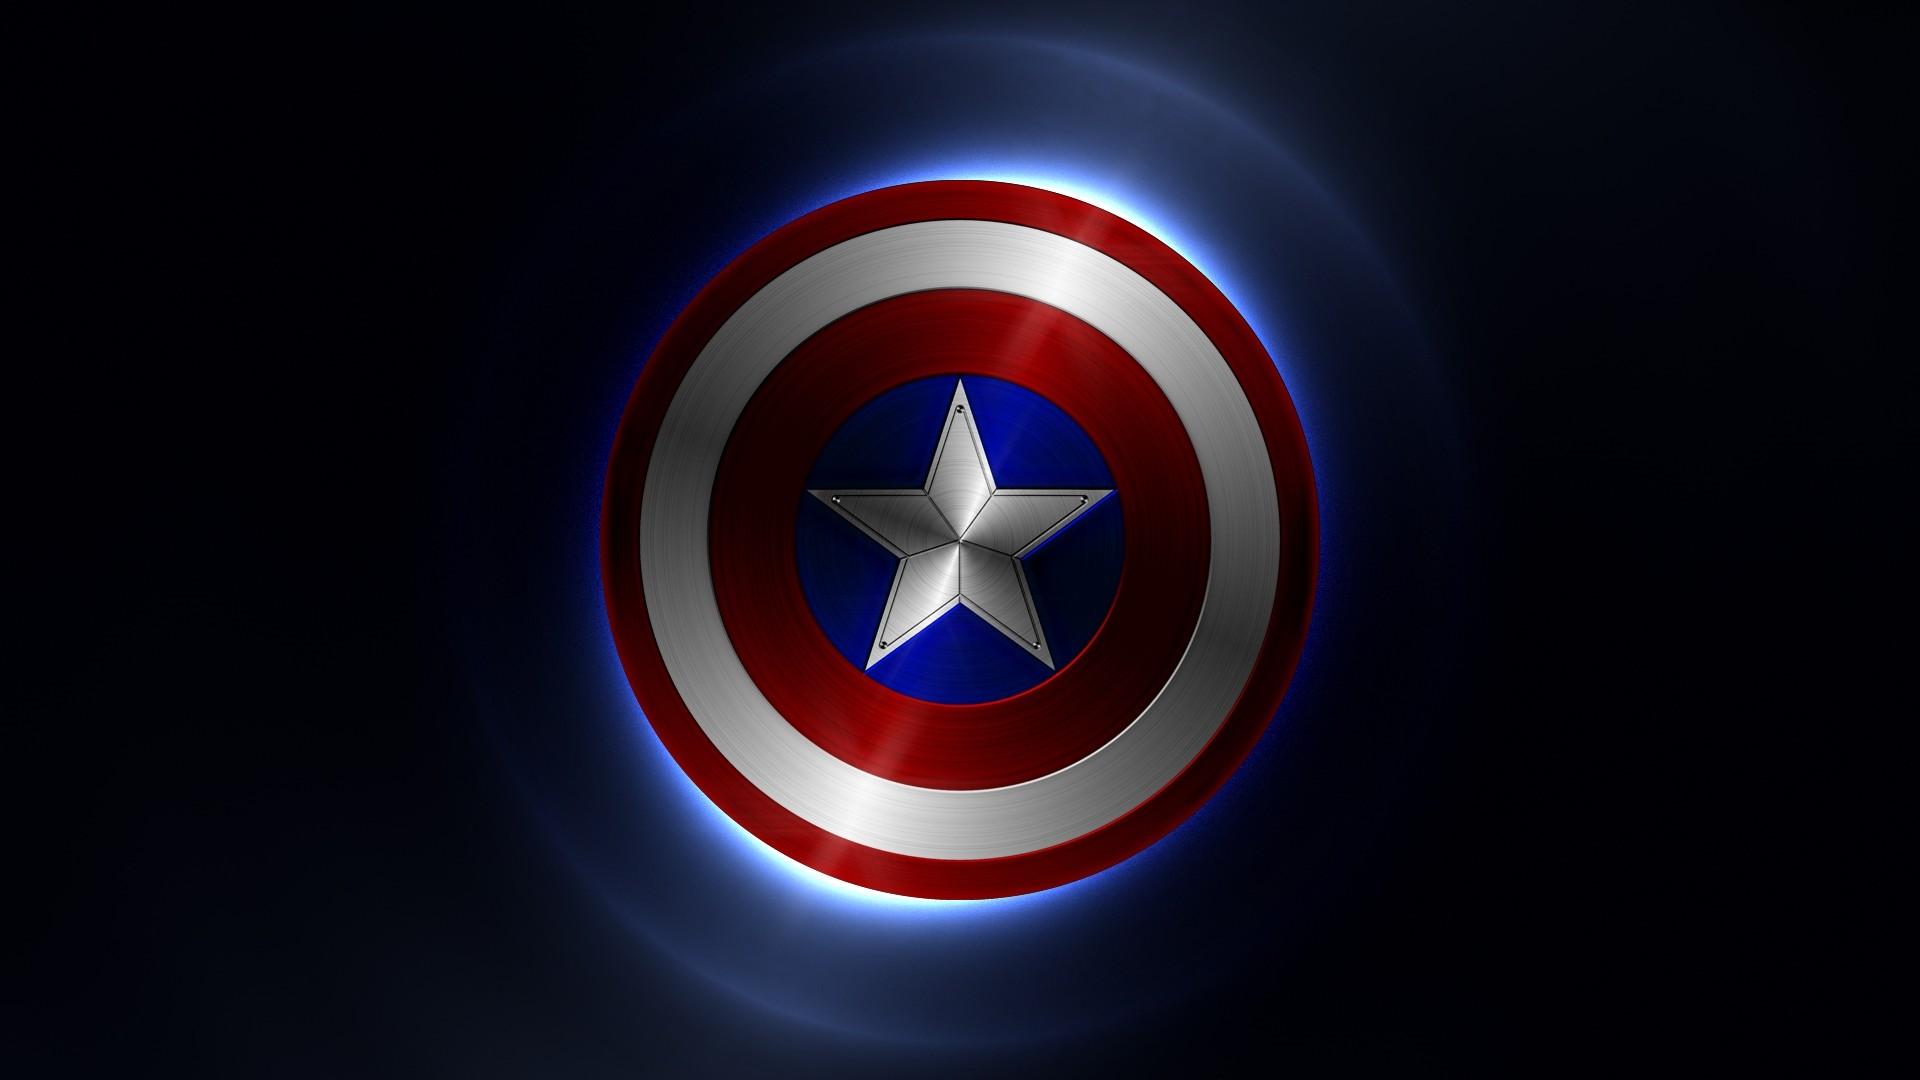 Wallpapers HD Captain America